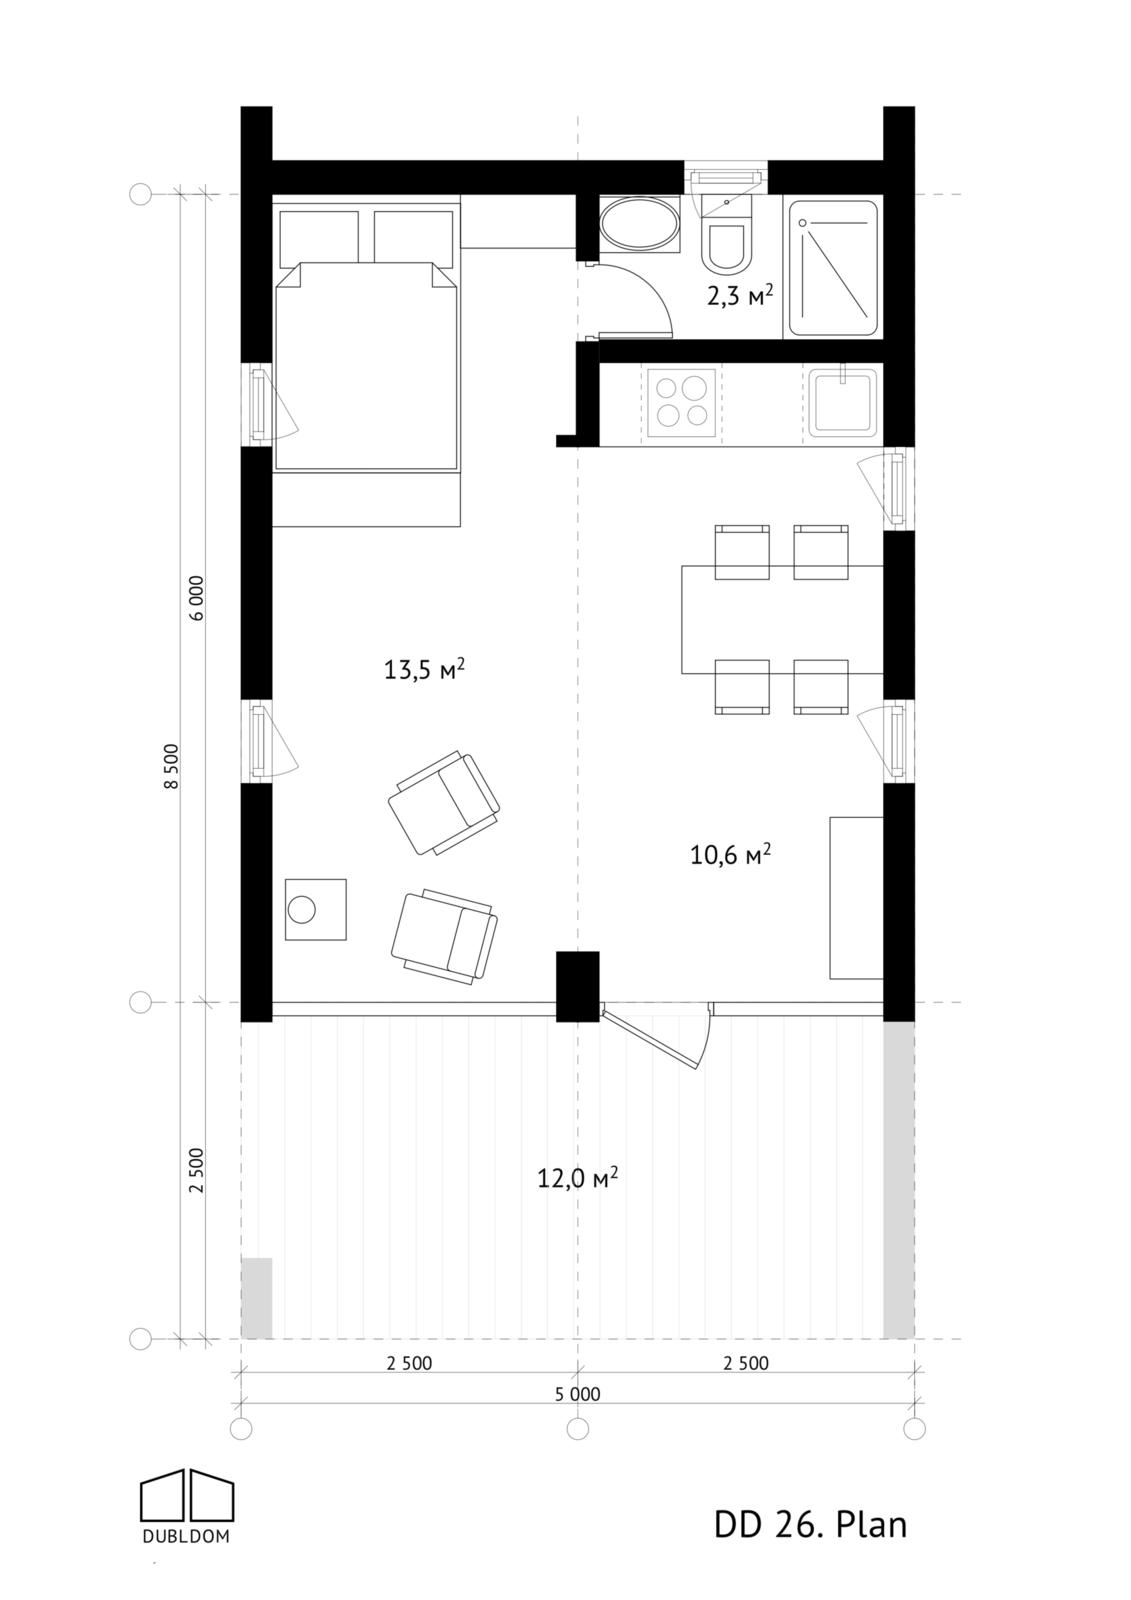 DublDom DD26 modular home floor plan